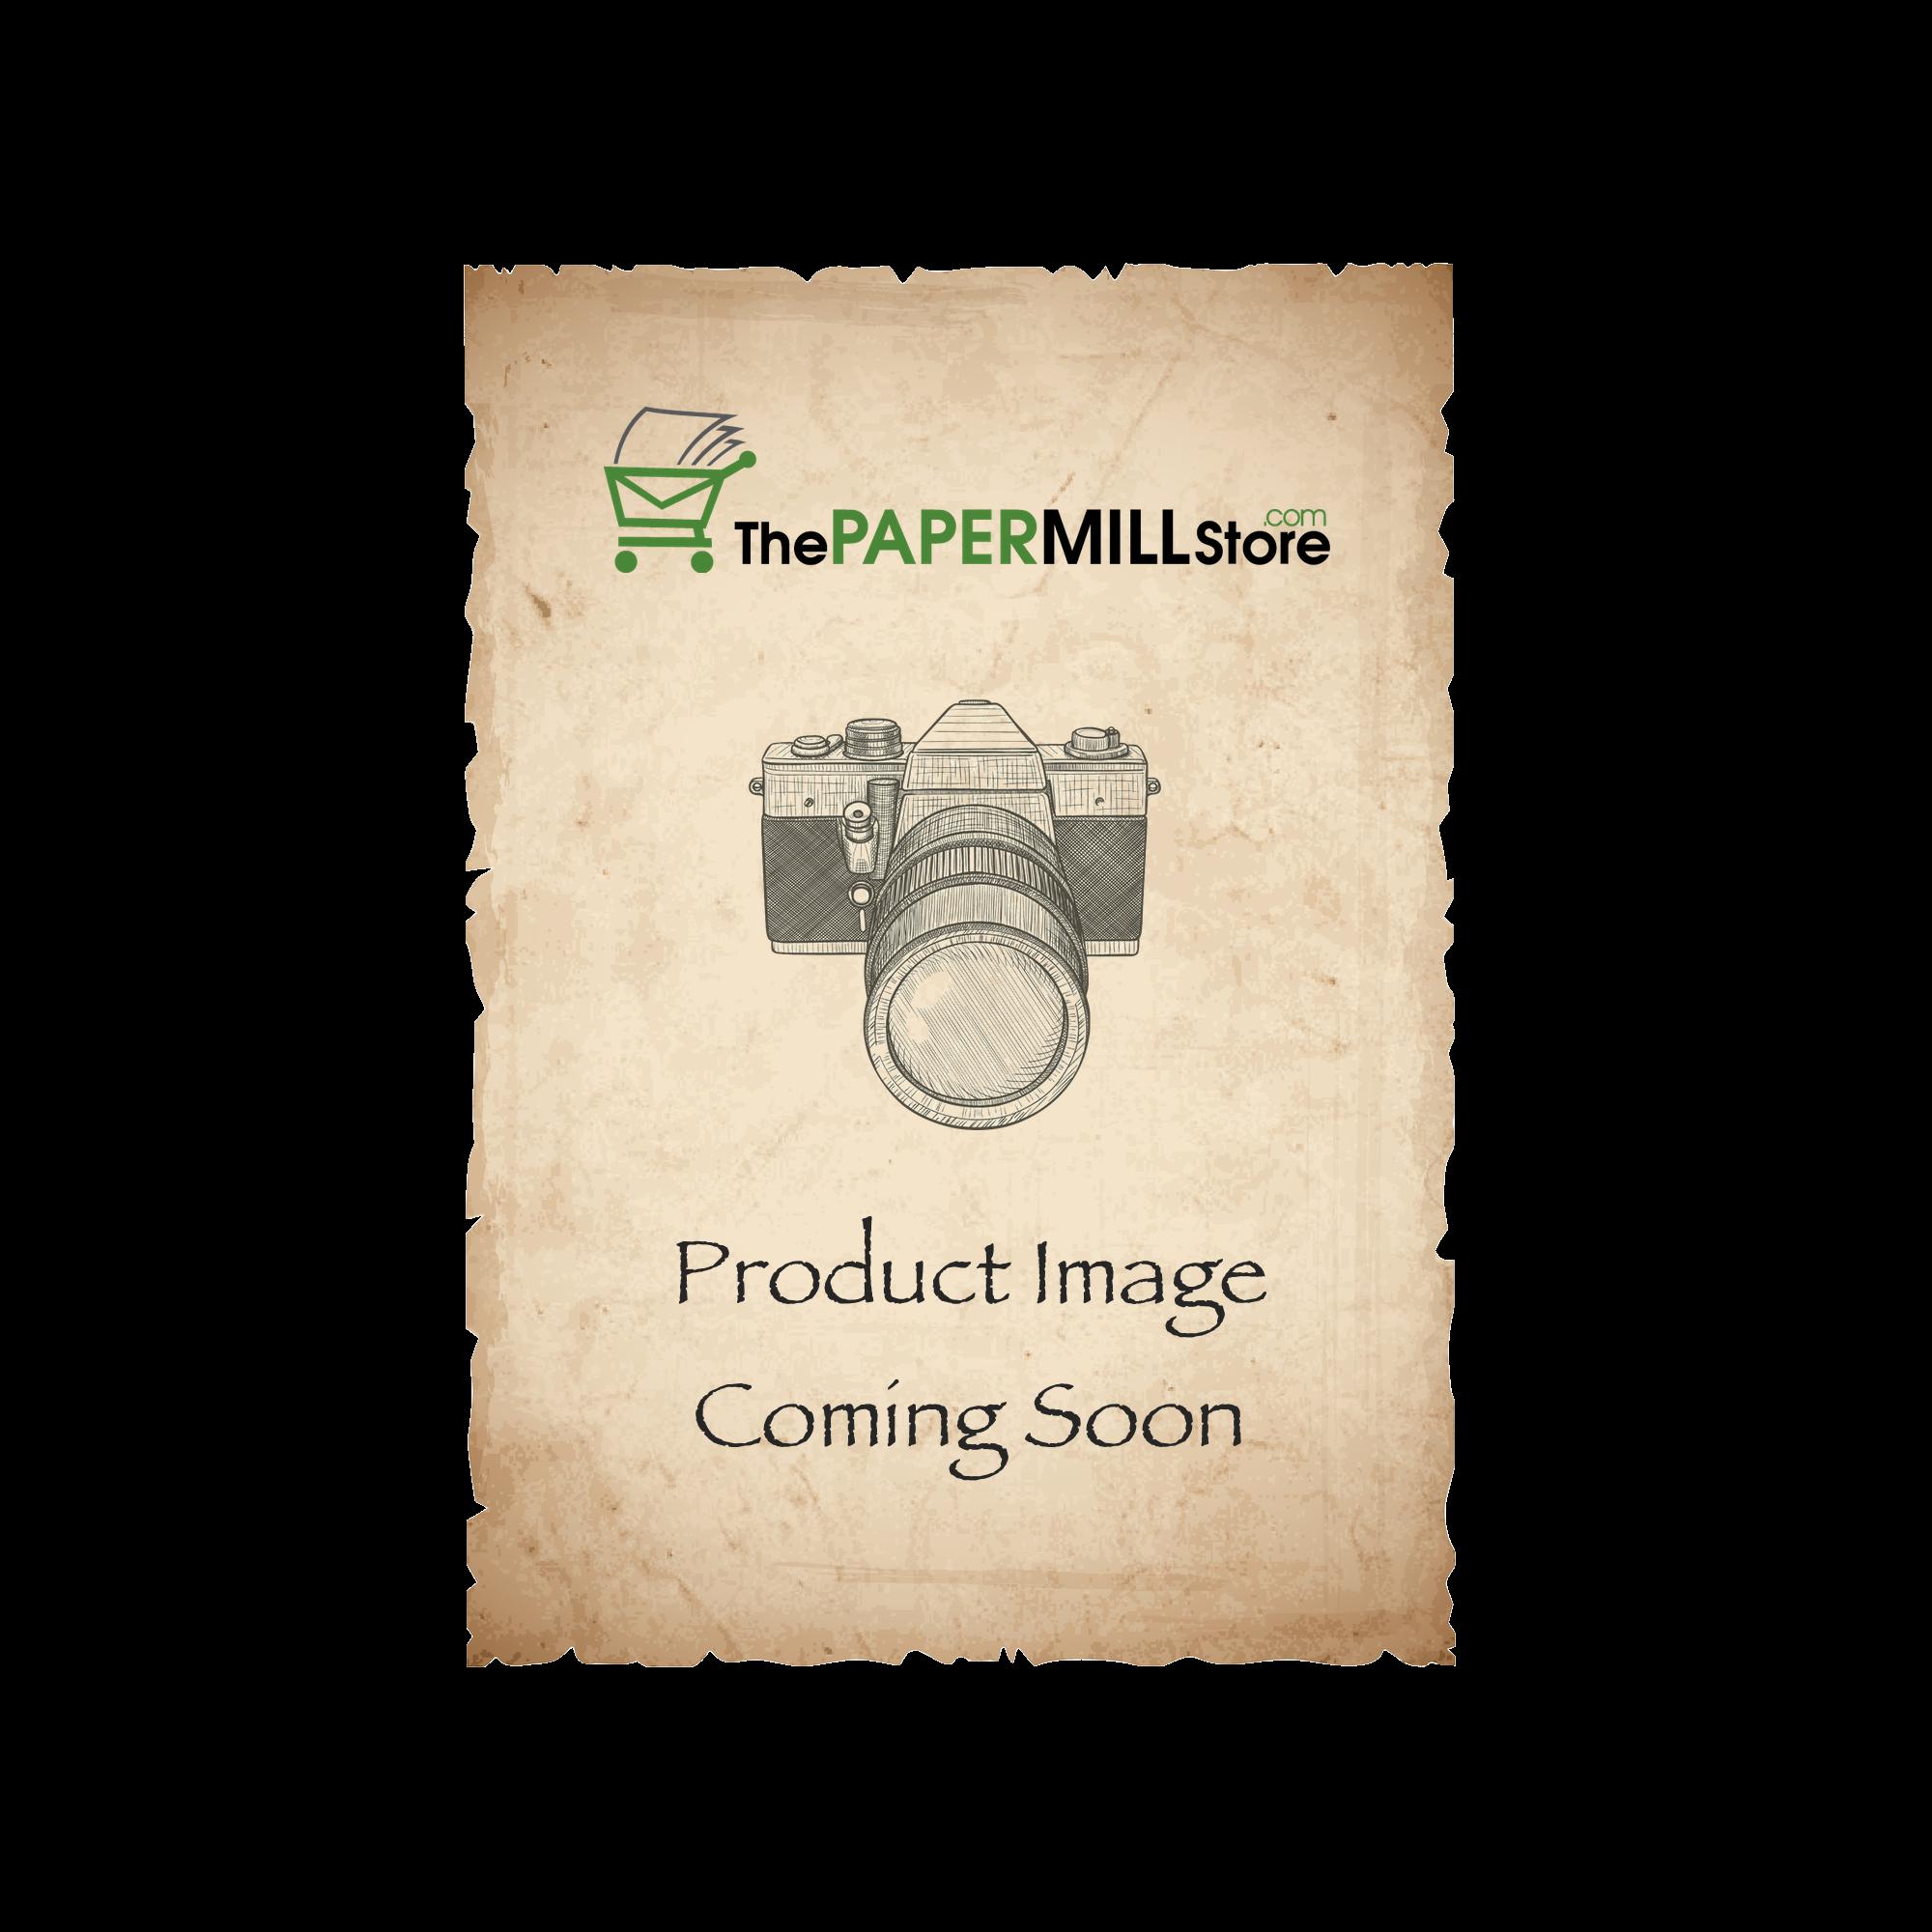 Via Vellum Cream White Envelopes - No. 10 Commercial (4 1/8 x 9 1/2) 60 lb Text Vellum  30% Recycled 500 per Box